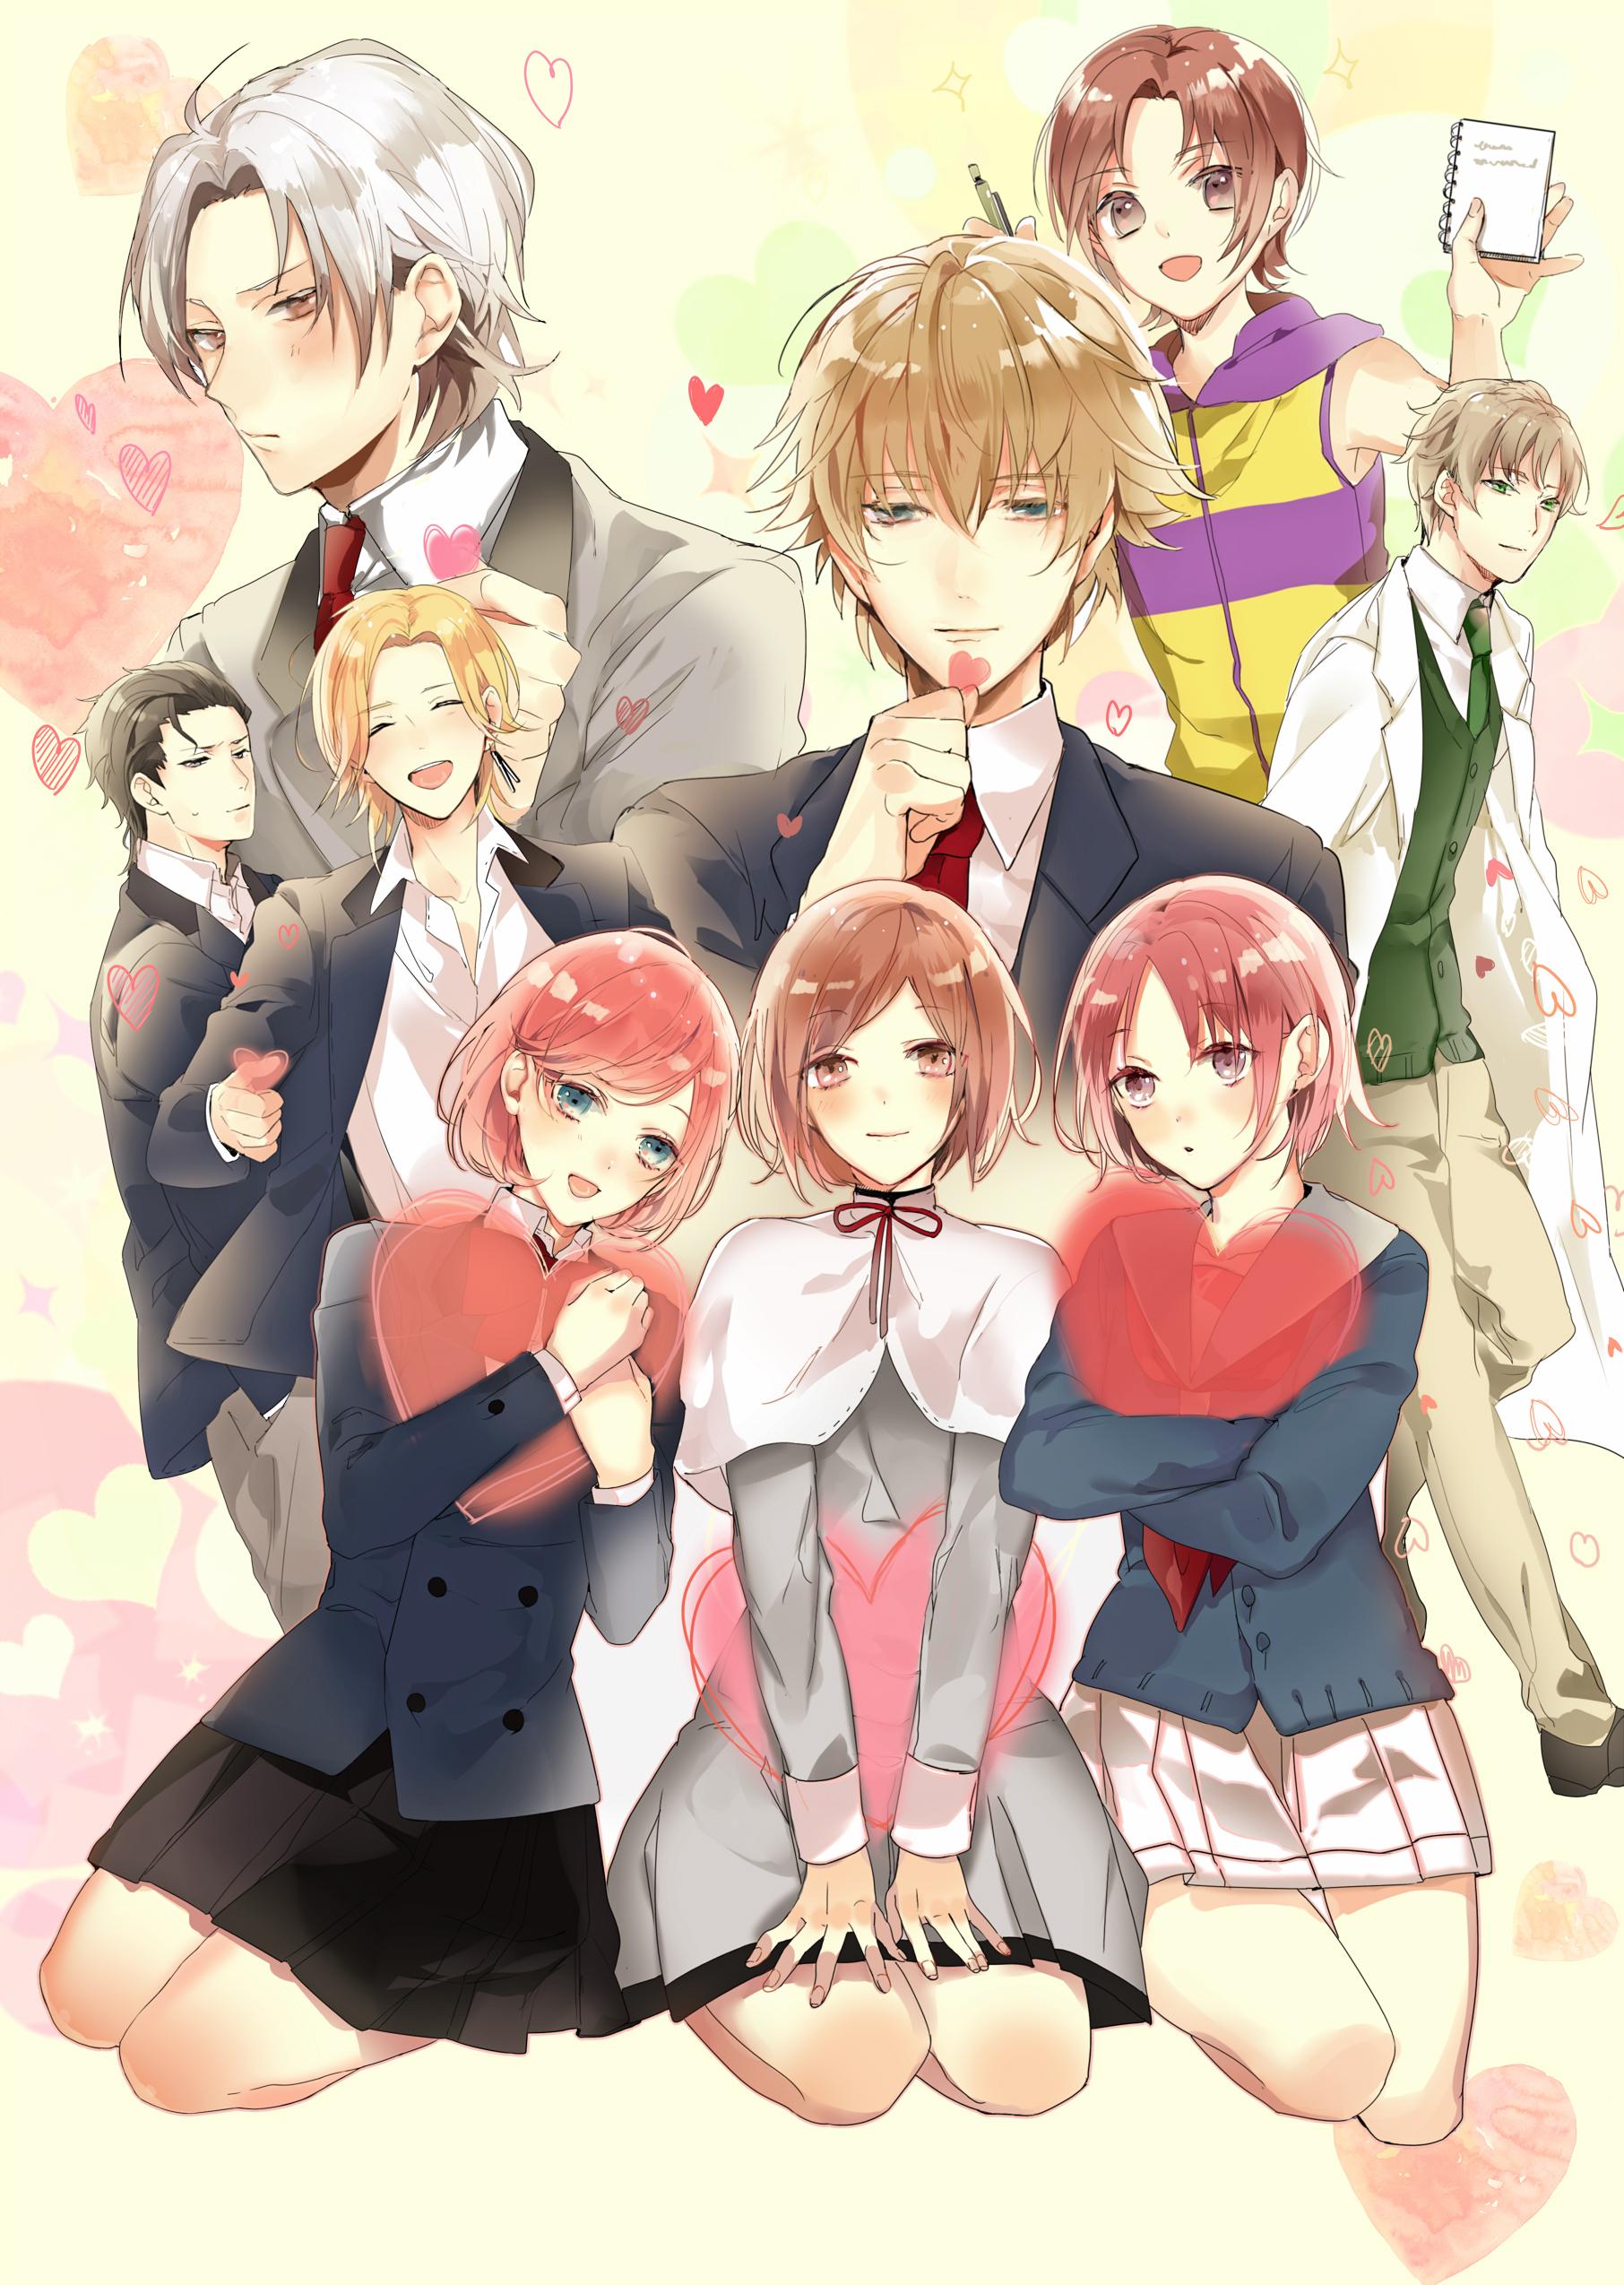 Tokimeki Memorial Girl S Side 1st Love Mobile Wallpaper 2068528 Zerochan Anime Image Board